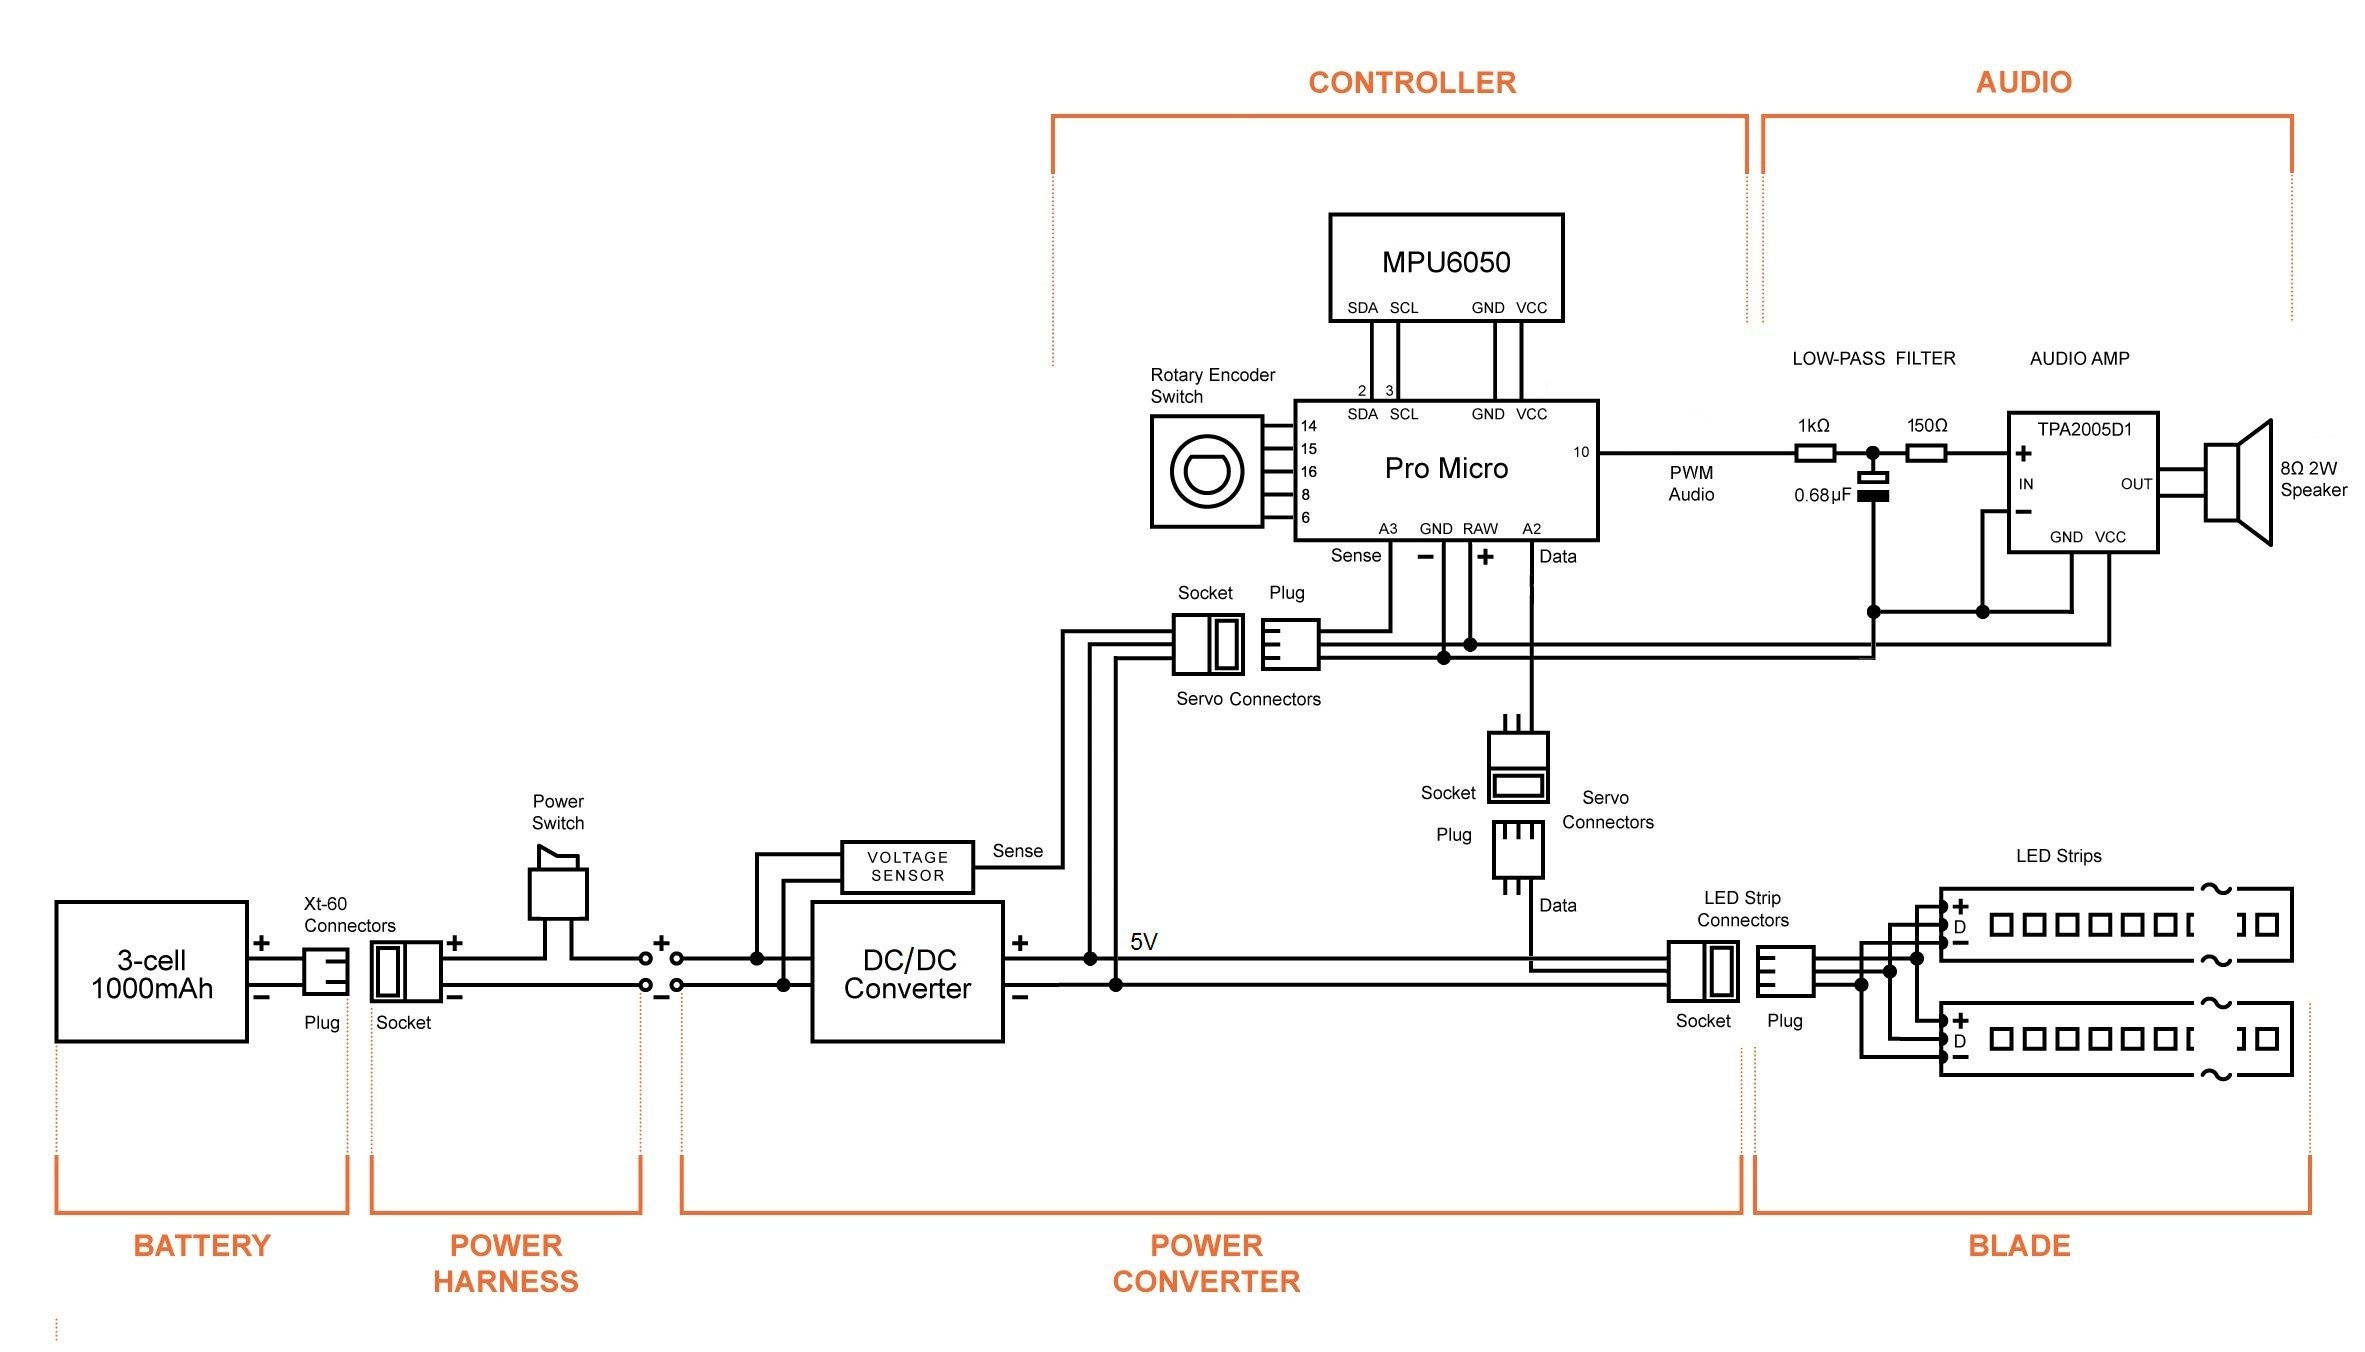 480v wye connection 12 lead motor wiring diagram lead lag wiring diagram lead lag pump control wiring diagram | free wiring diagram